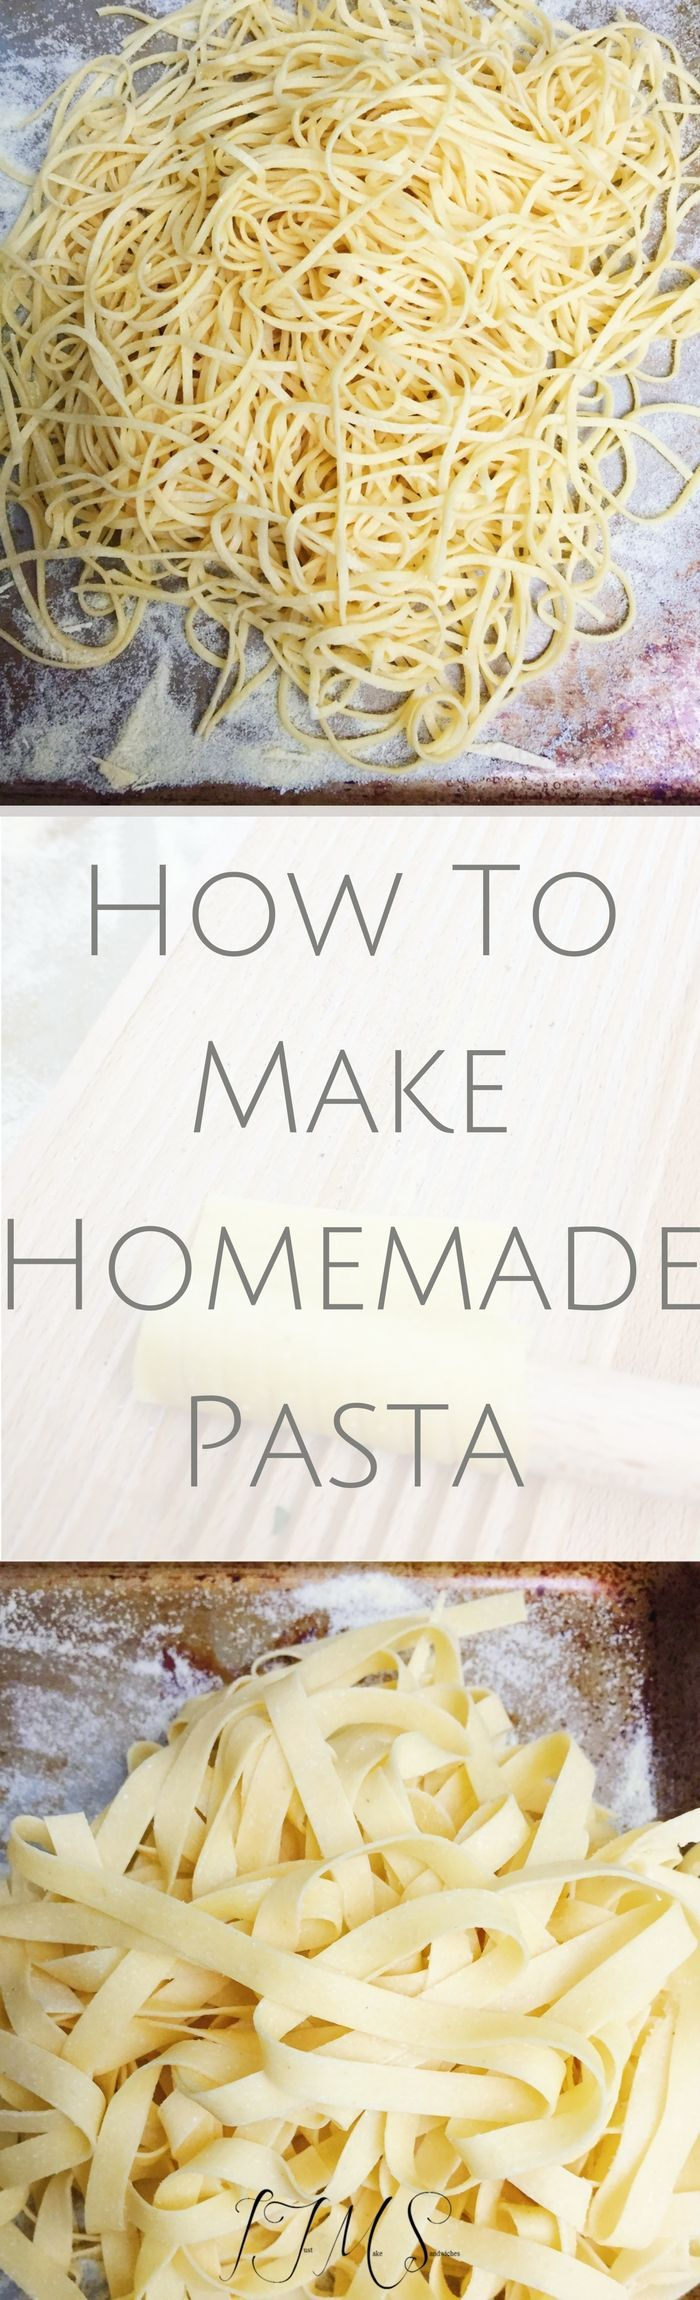 Tackling pasta dough can seem a bit daunting but as long as you follow my tips, making homemade pasta will be breeze!